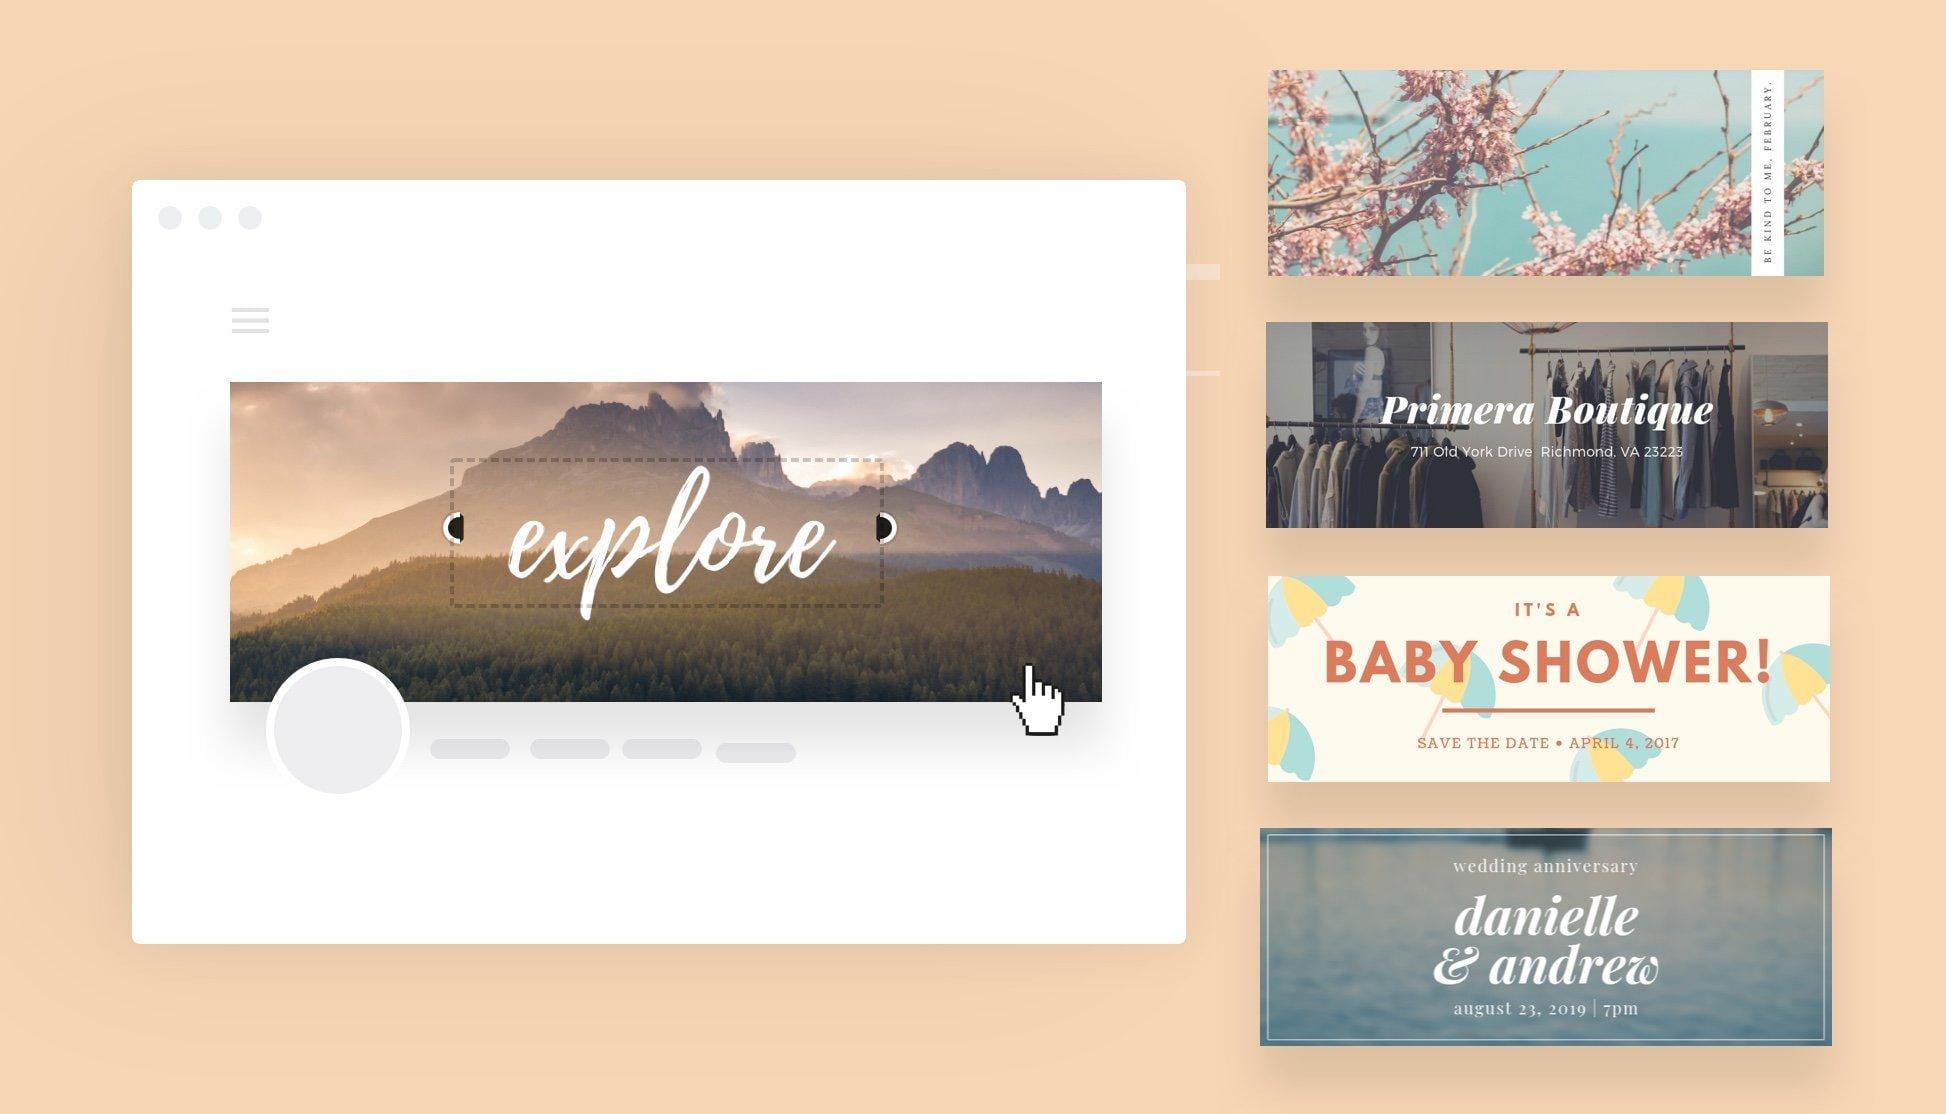 aplikasi desain banner, banner background - Canva